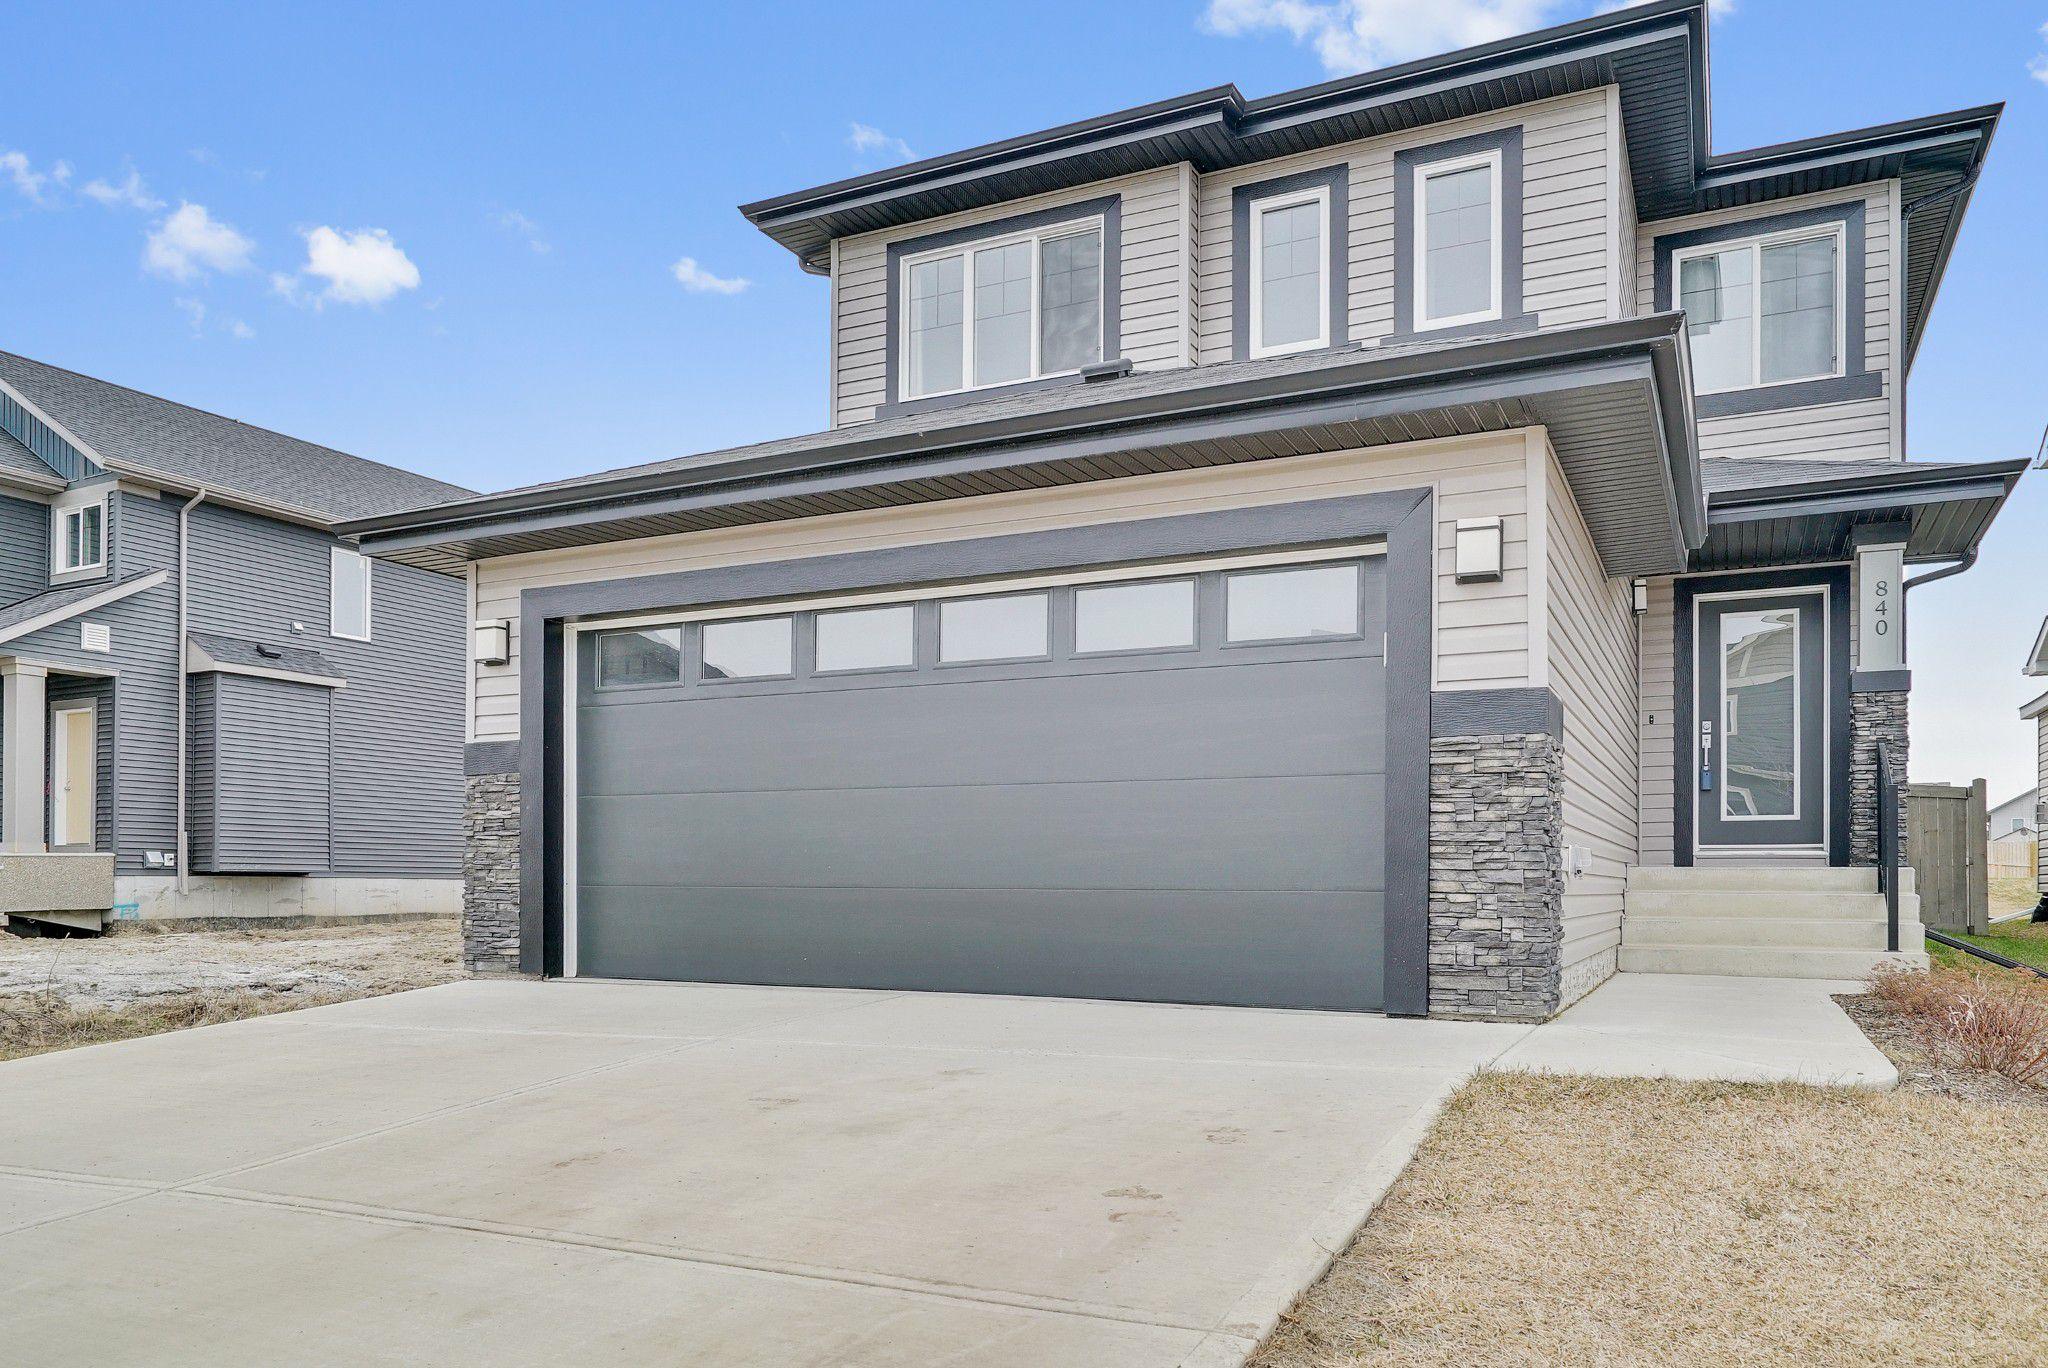 Main Photo: 840 Crystallina Nera Way NW in Edmonton: Crystallina Nera West House for sale : MLS®# E4152915